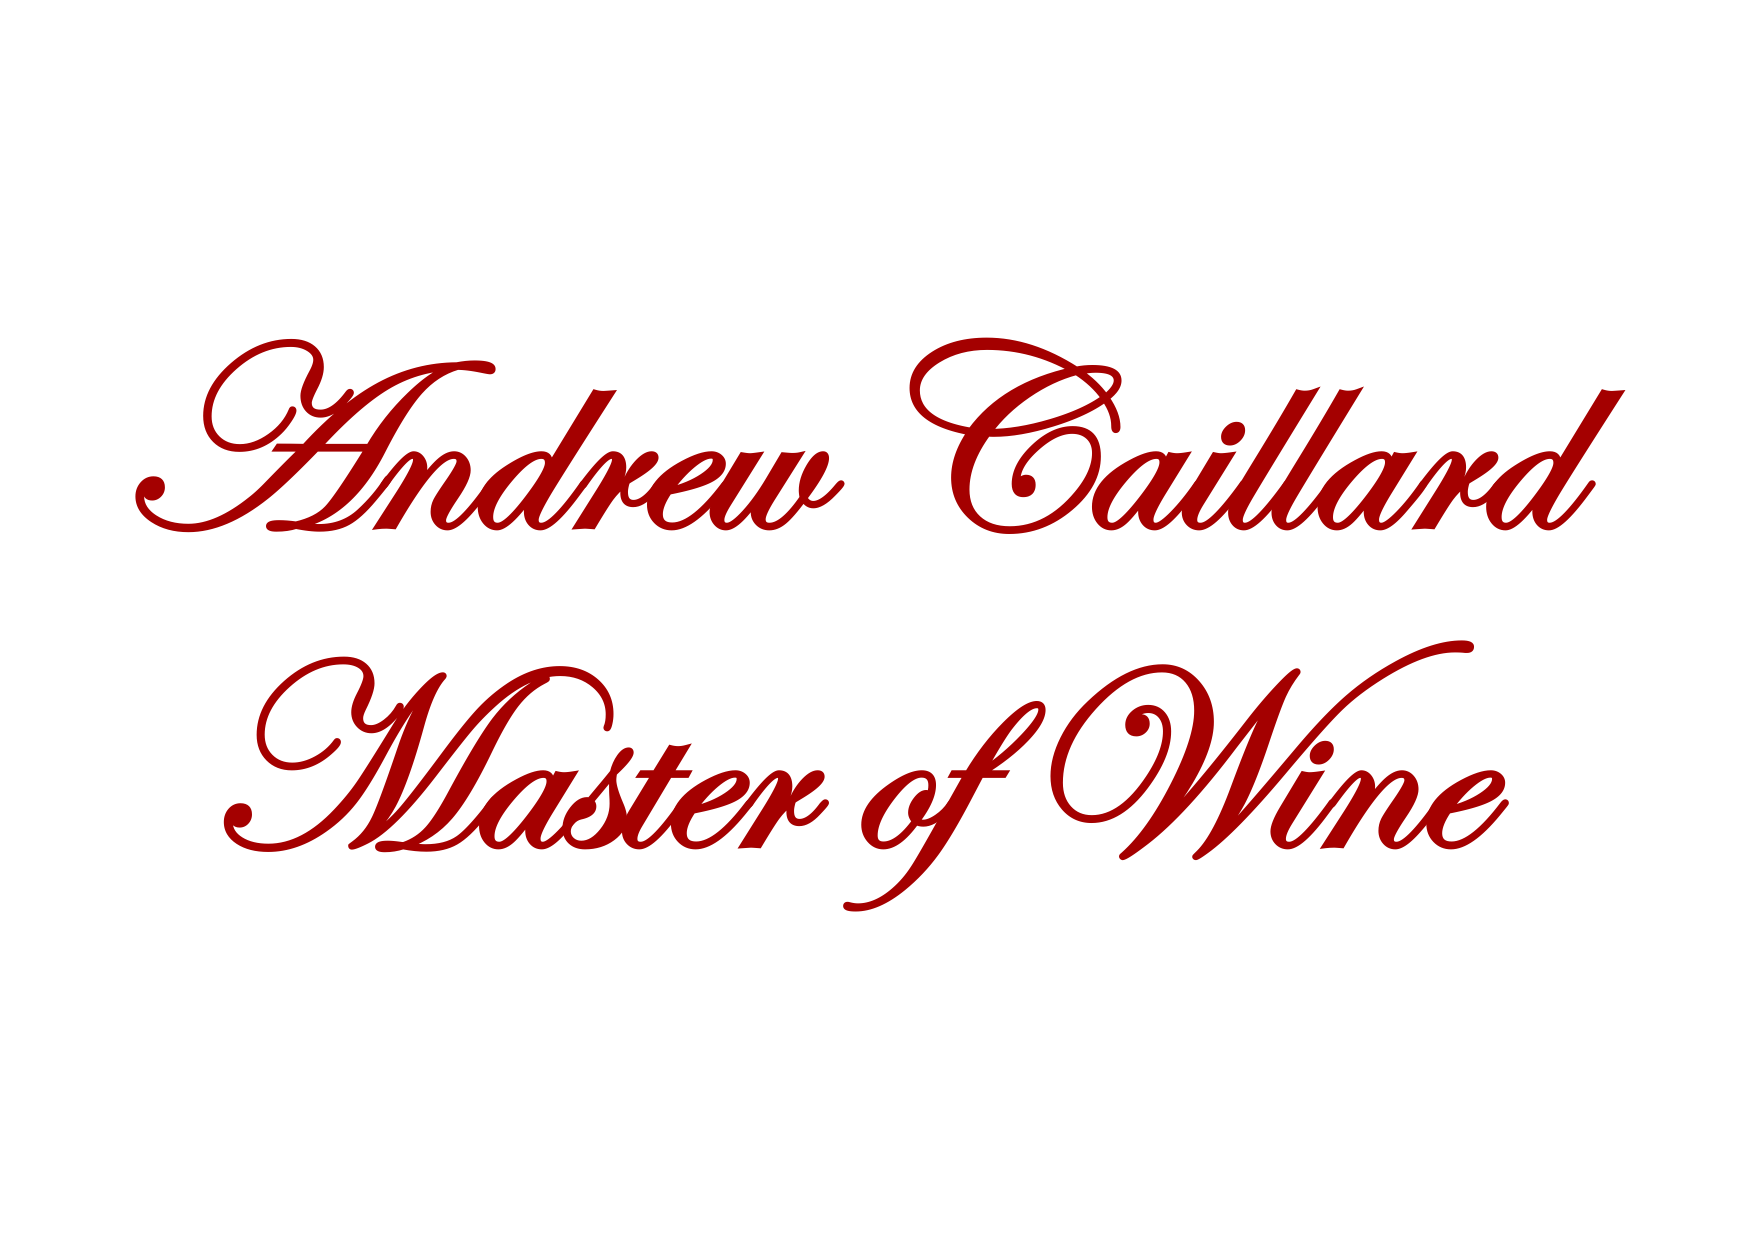 Andrew Caillard, Master of Wine